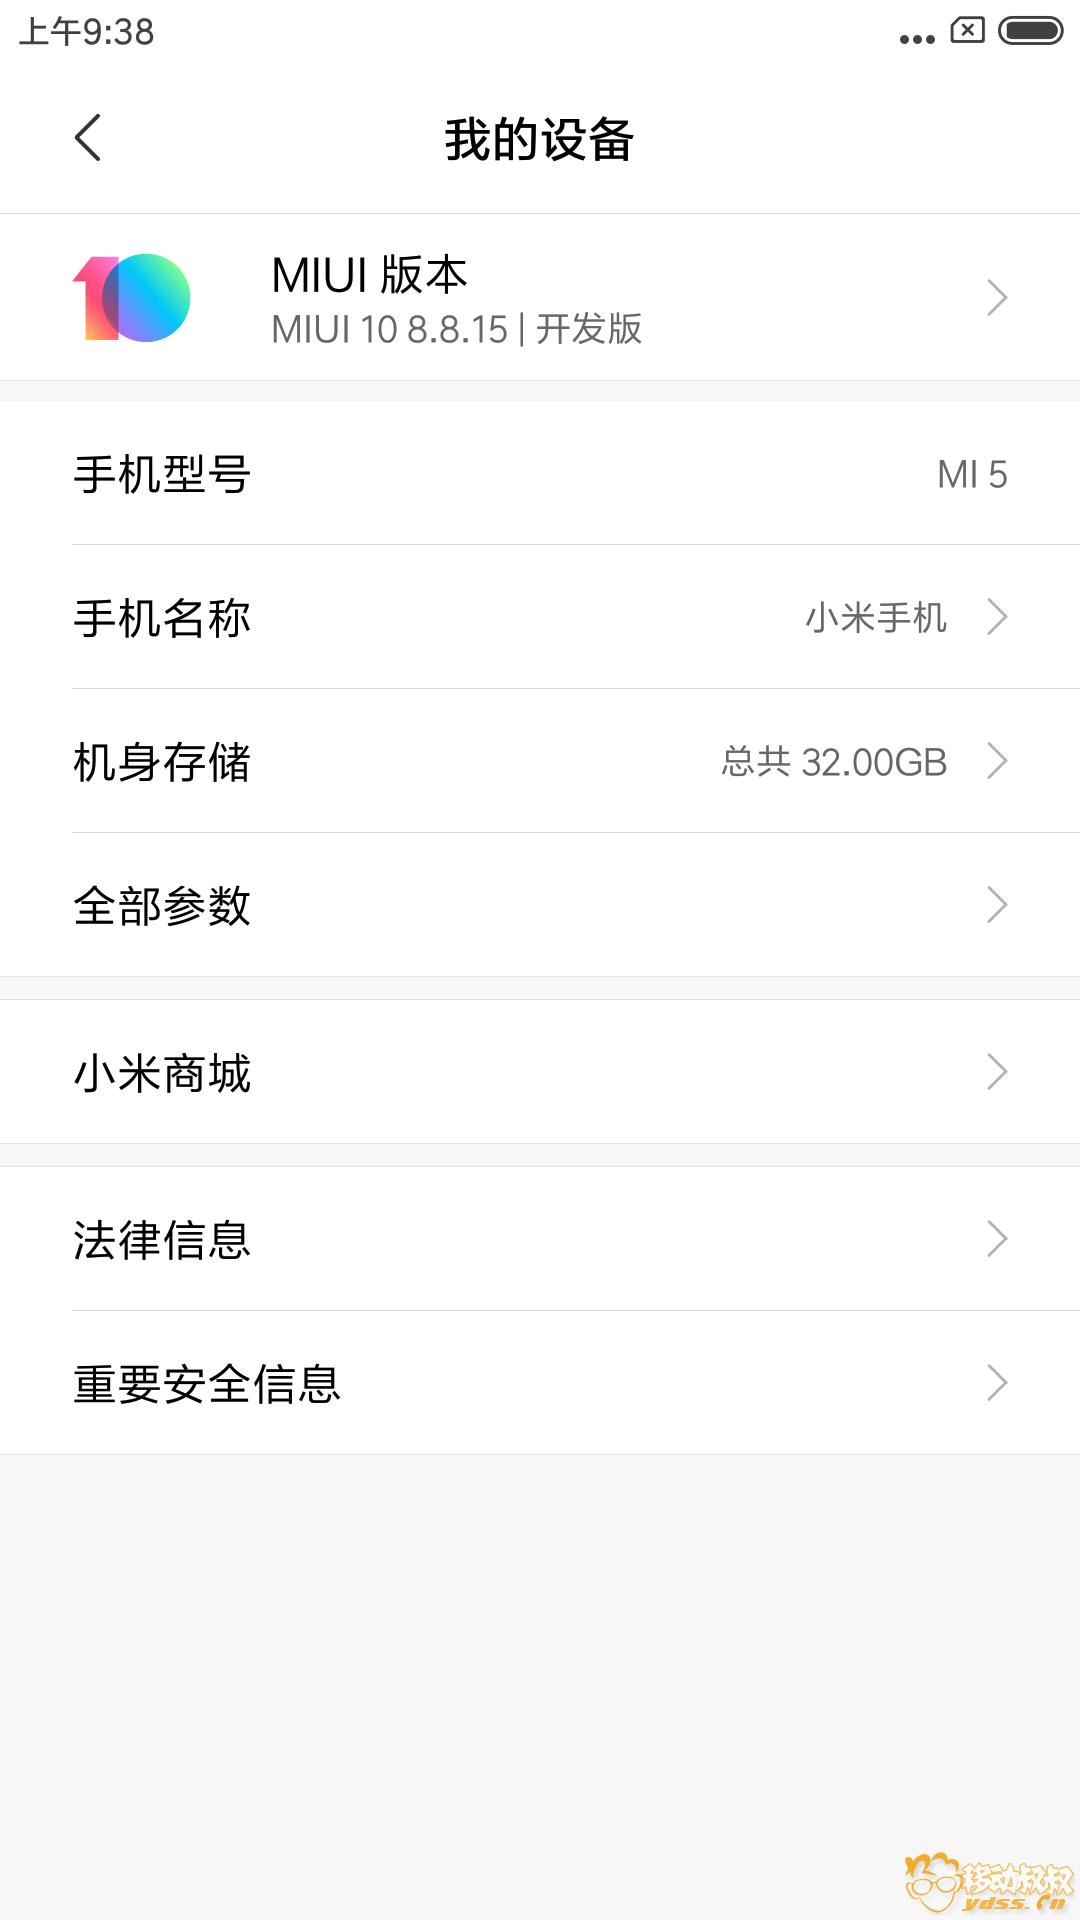 Screenshot_2018-08-15-09-38-11-287_com.android.settings.png